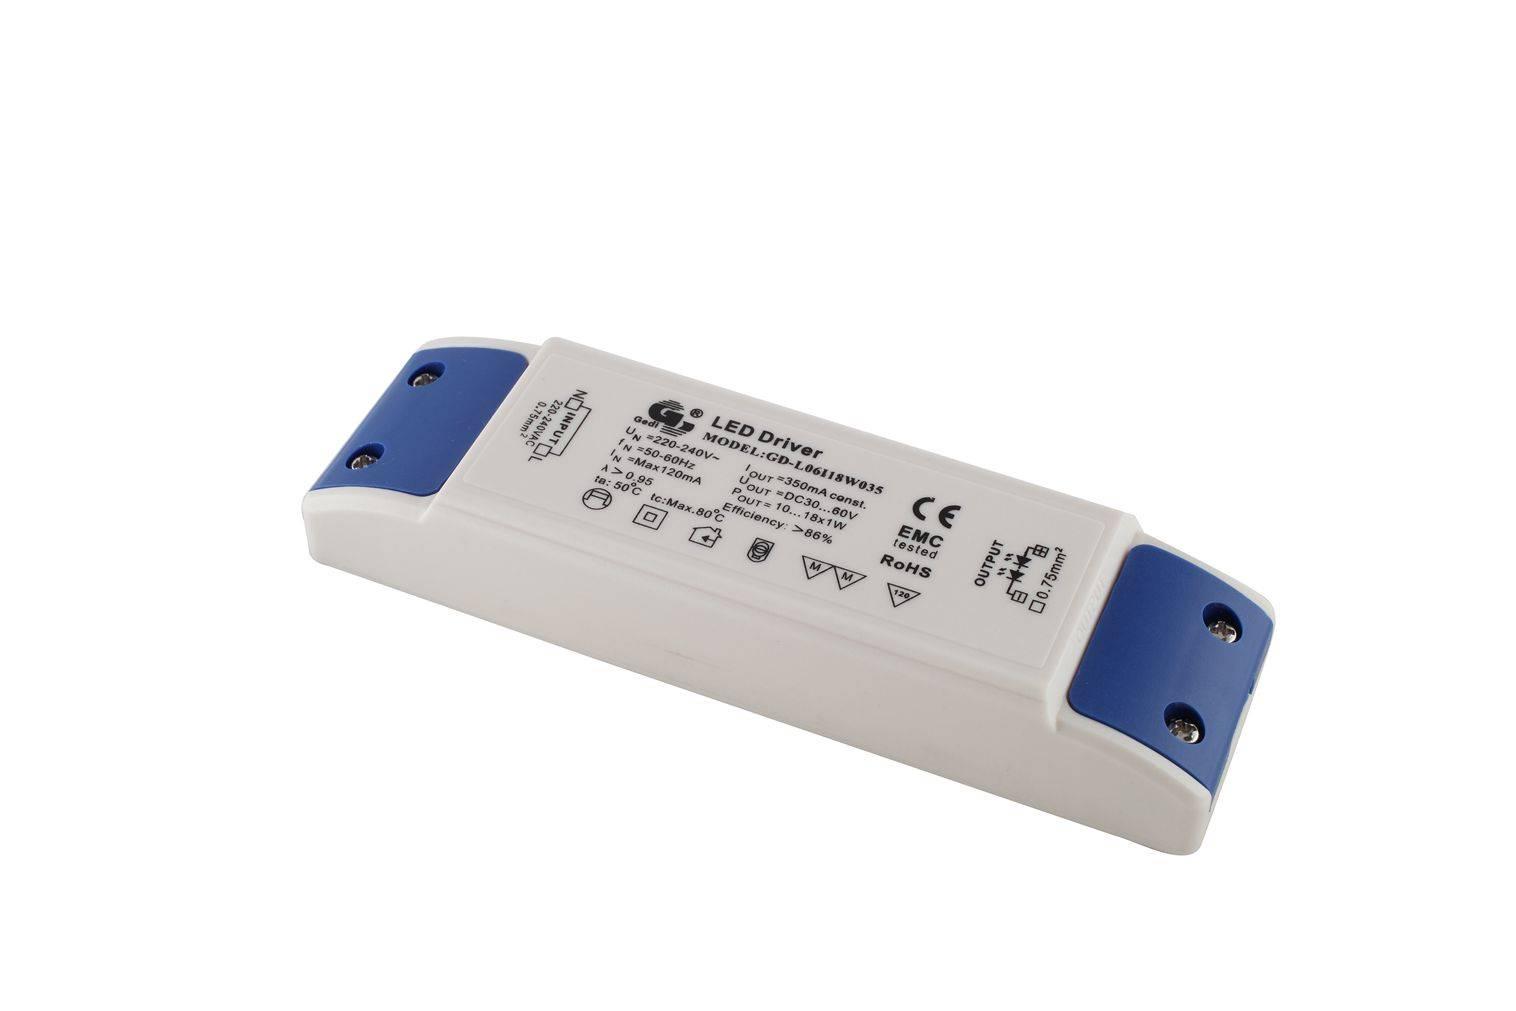 LED Driver GD-MC06I series